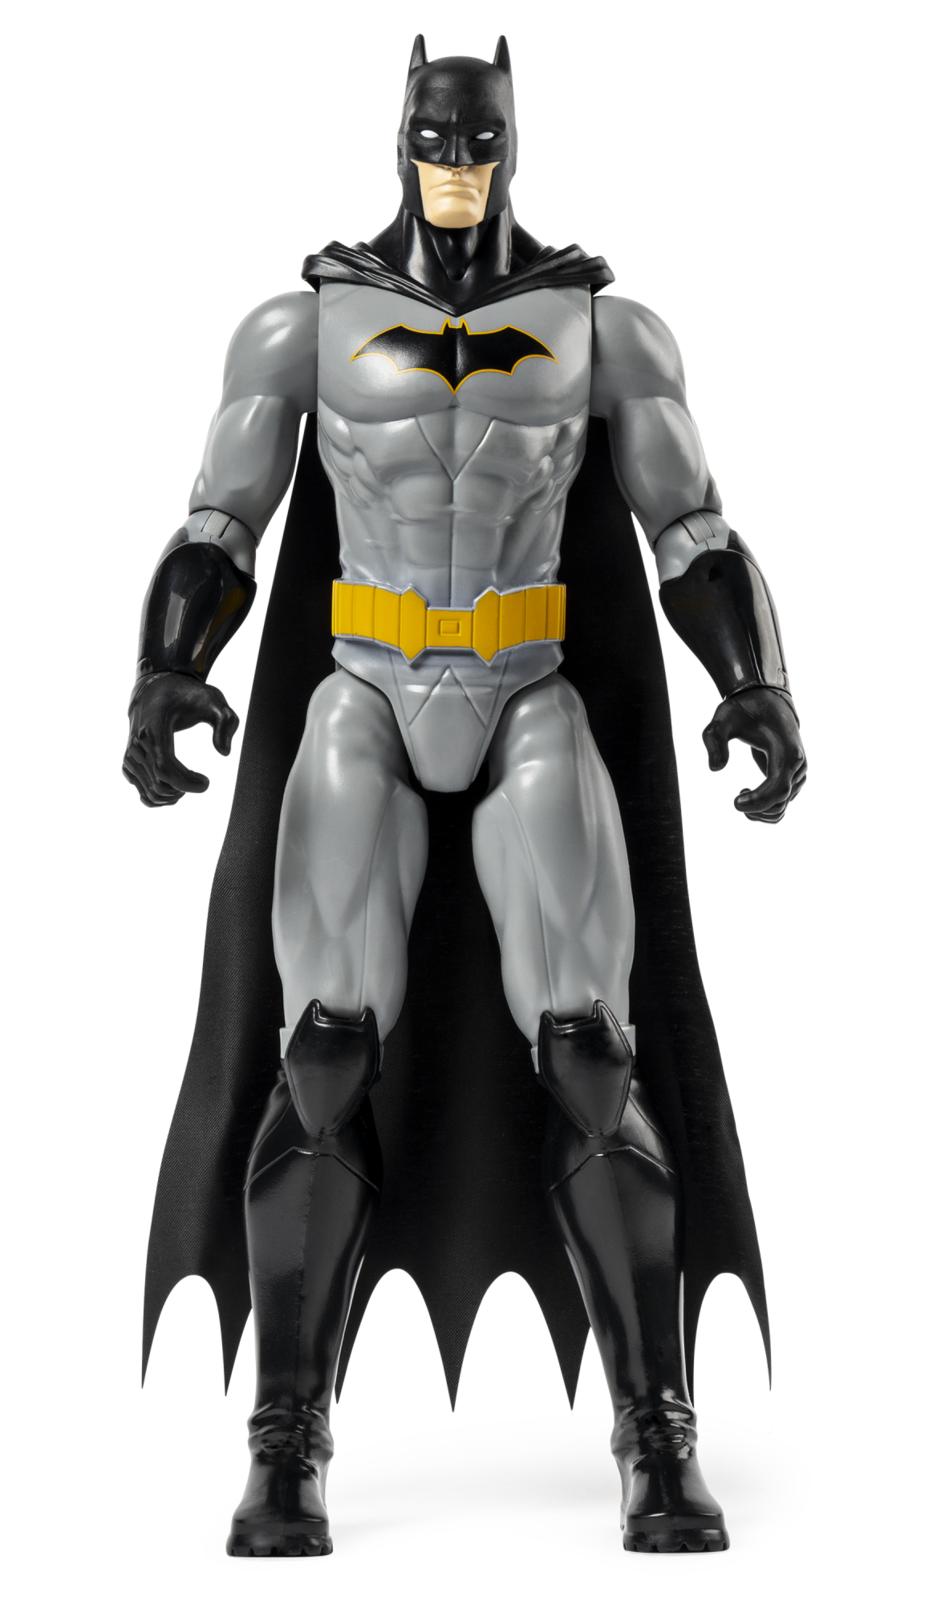 coolshop.co.uk - Batman – 30 cm Figure – Batman, Grey